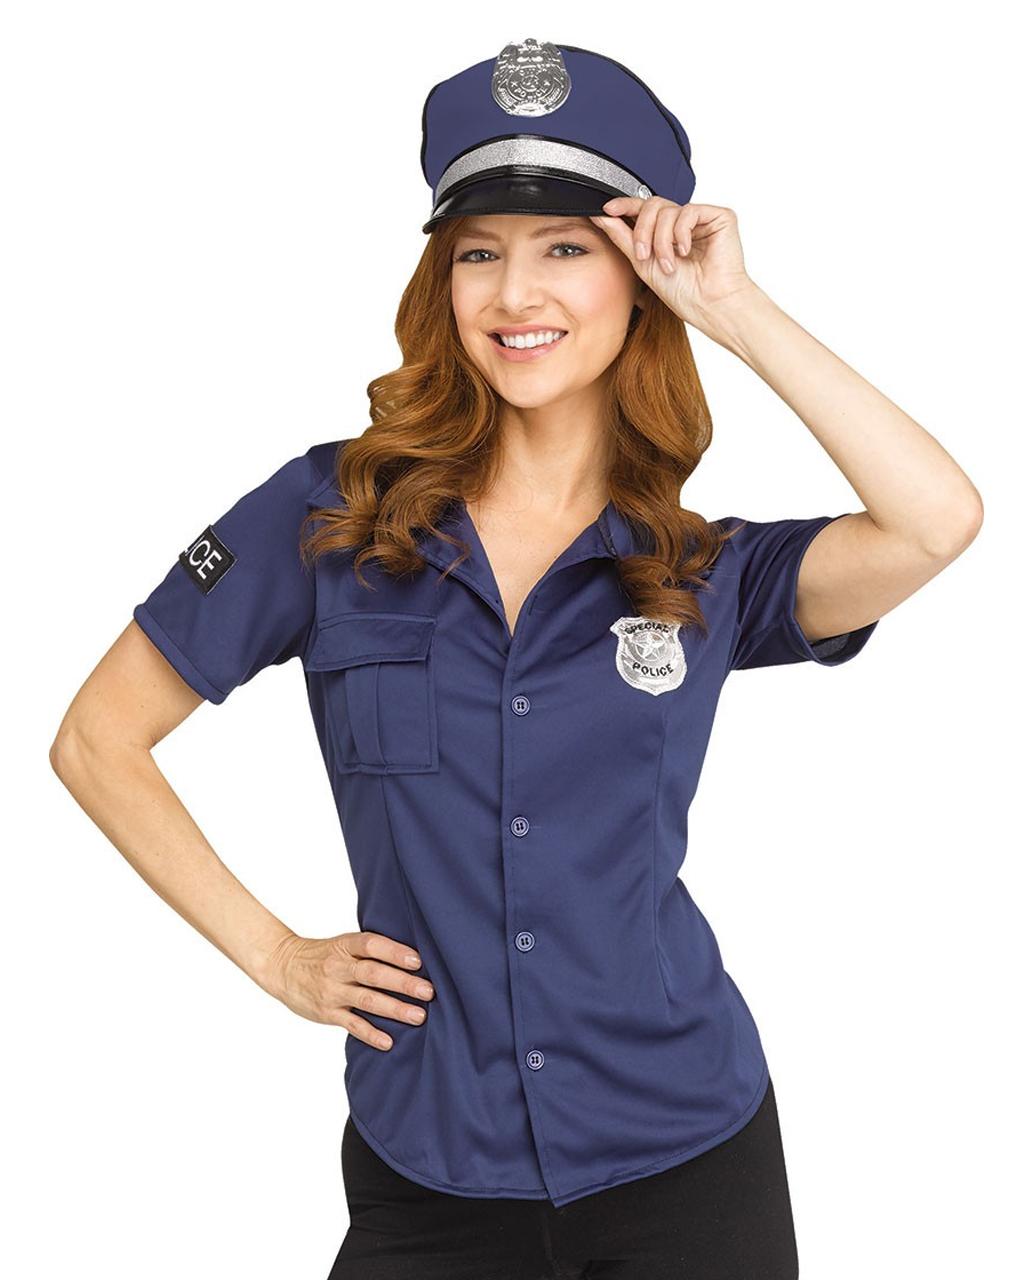 Police Kostumshirt Fur Damen Karneval Verkleidung Horror Shop Com